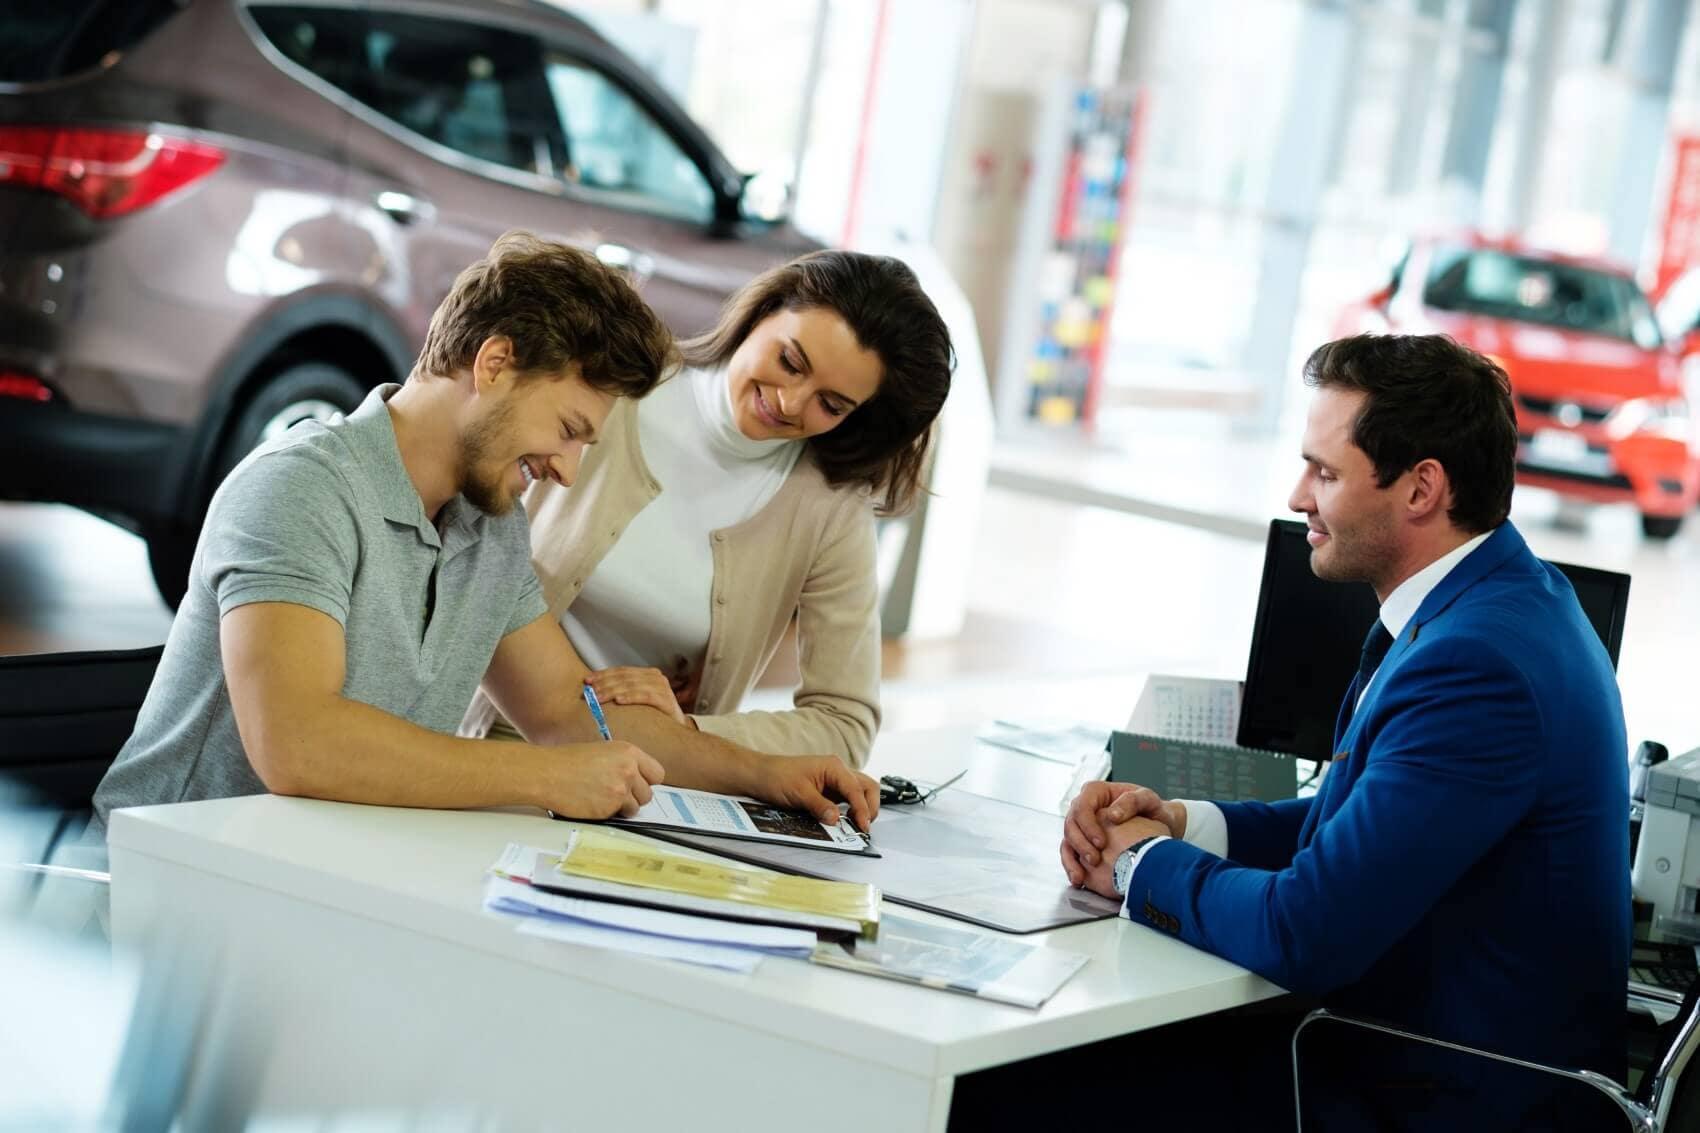 Dennis Hyundai Buys Cars